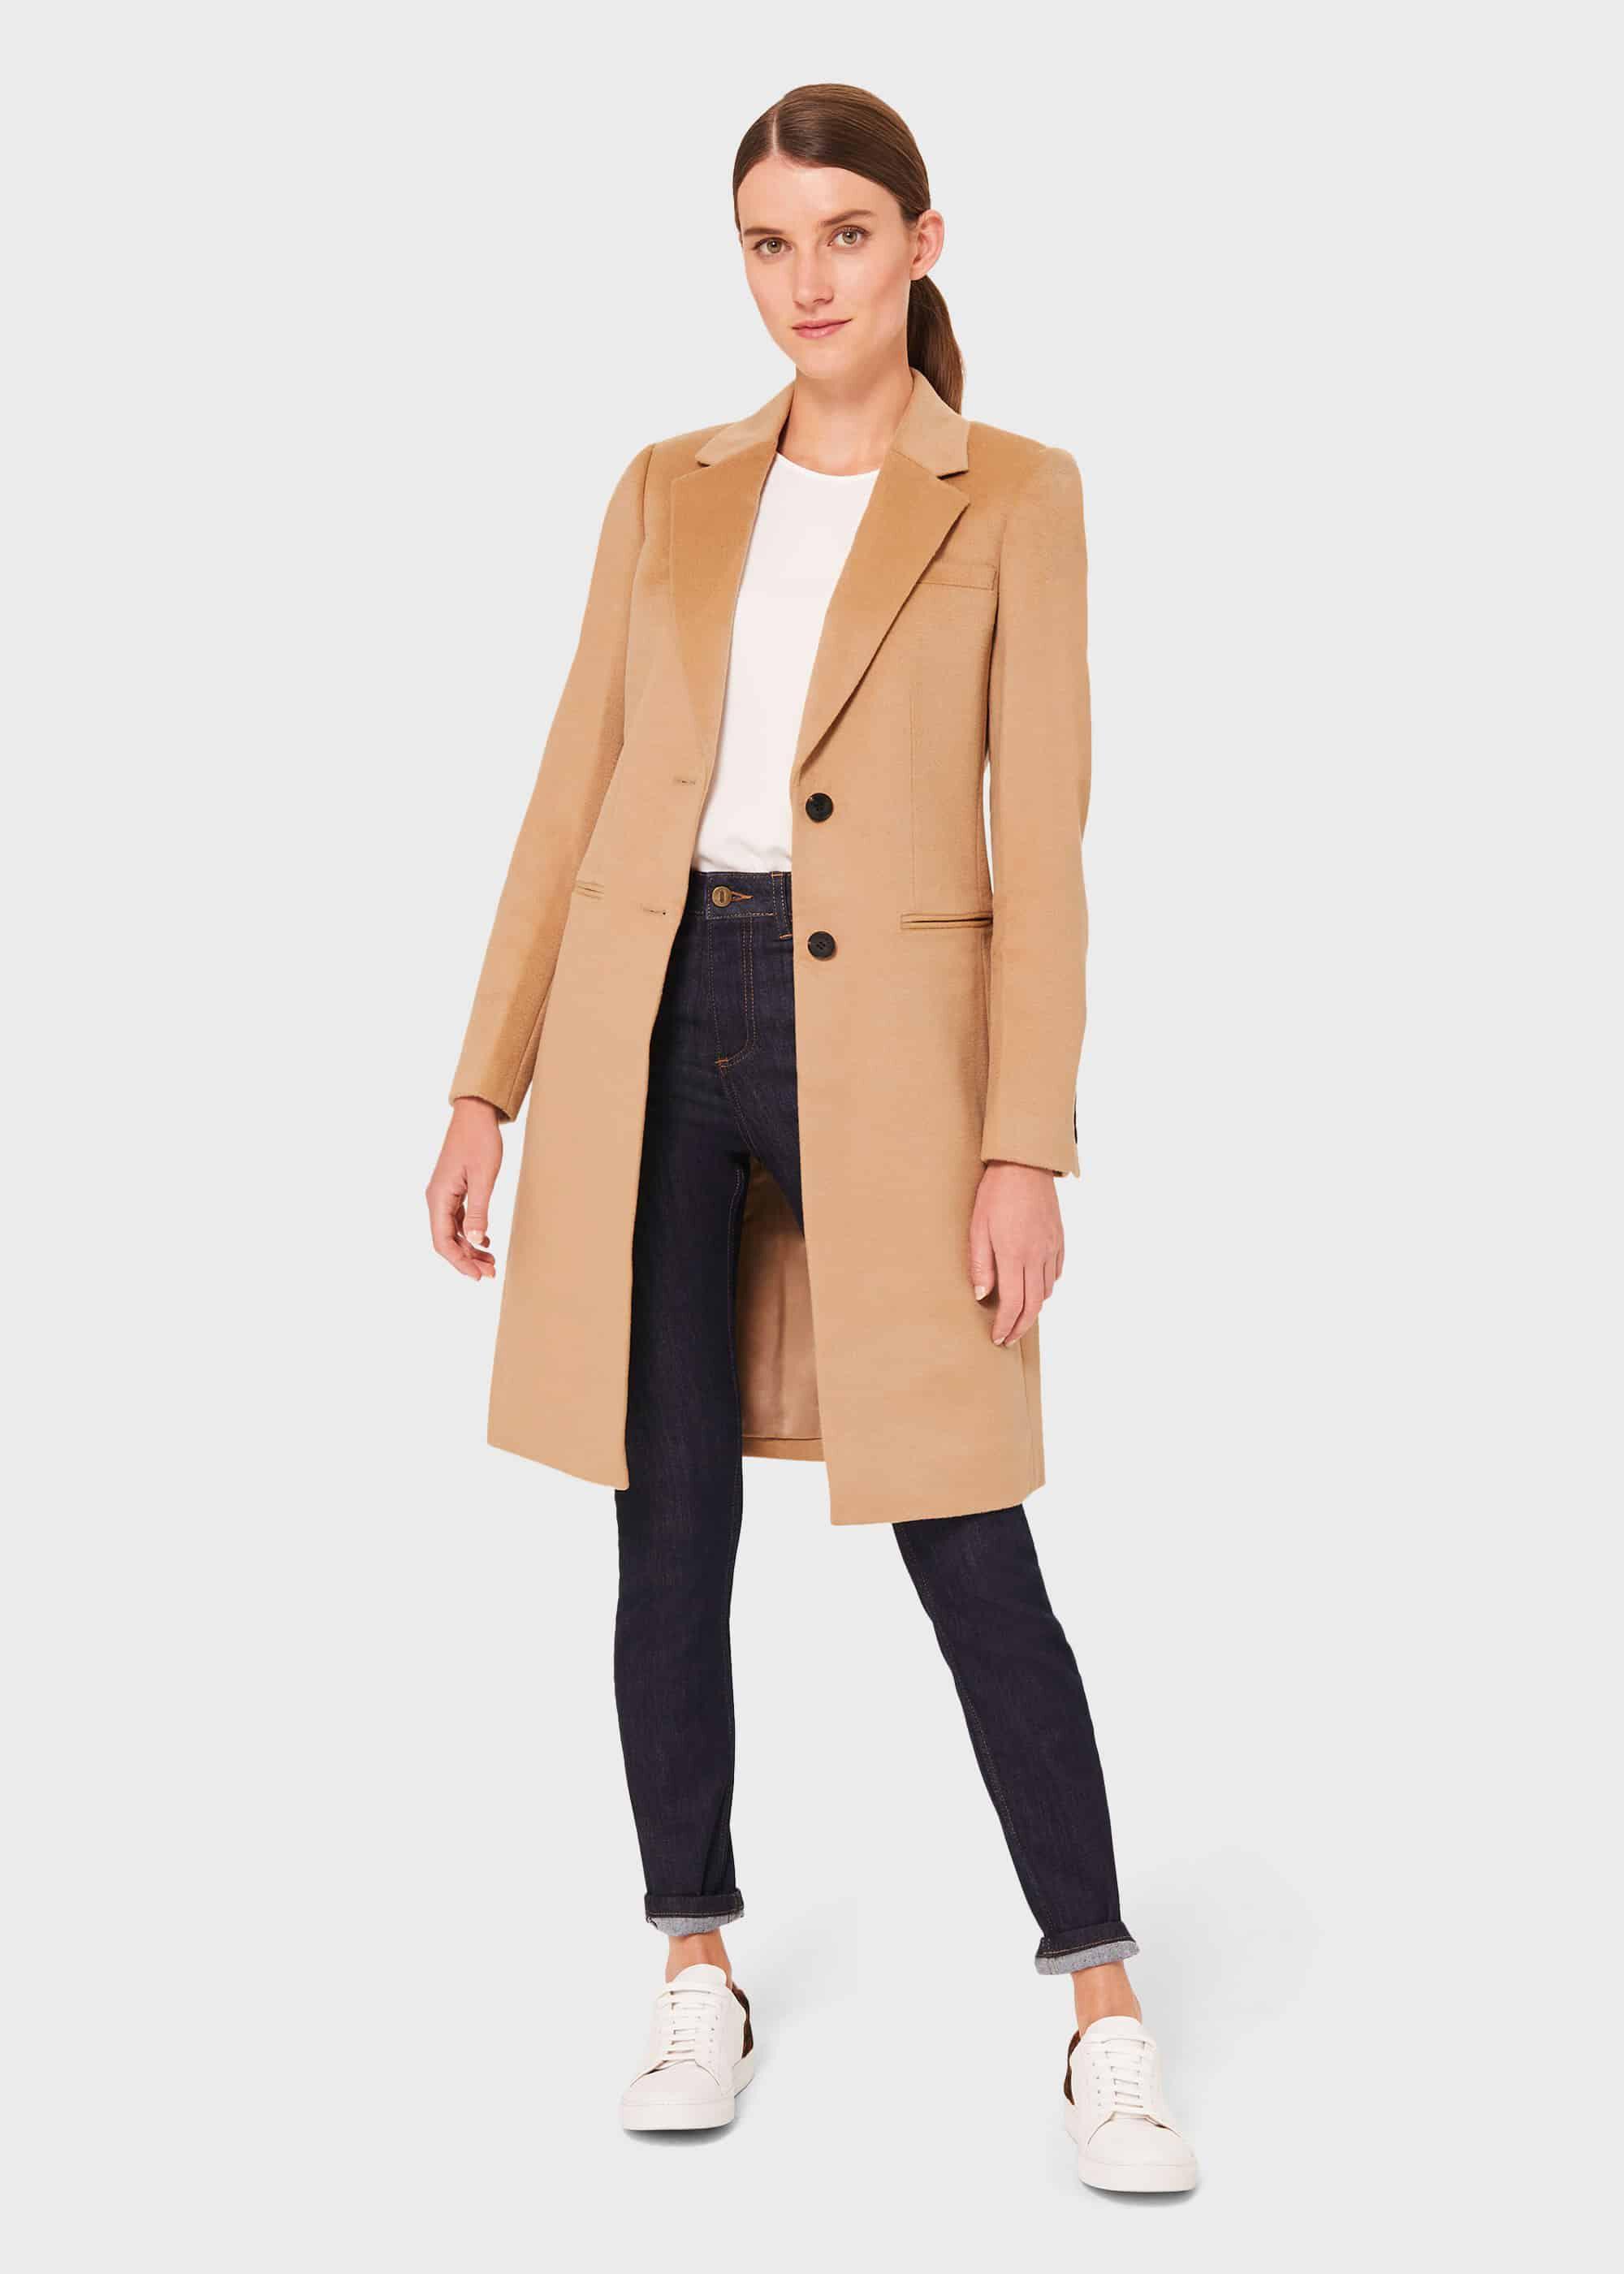 Ladies Long Wool Coats Uk, Womens Black Wool Coats Uk